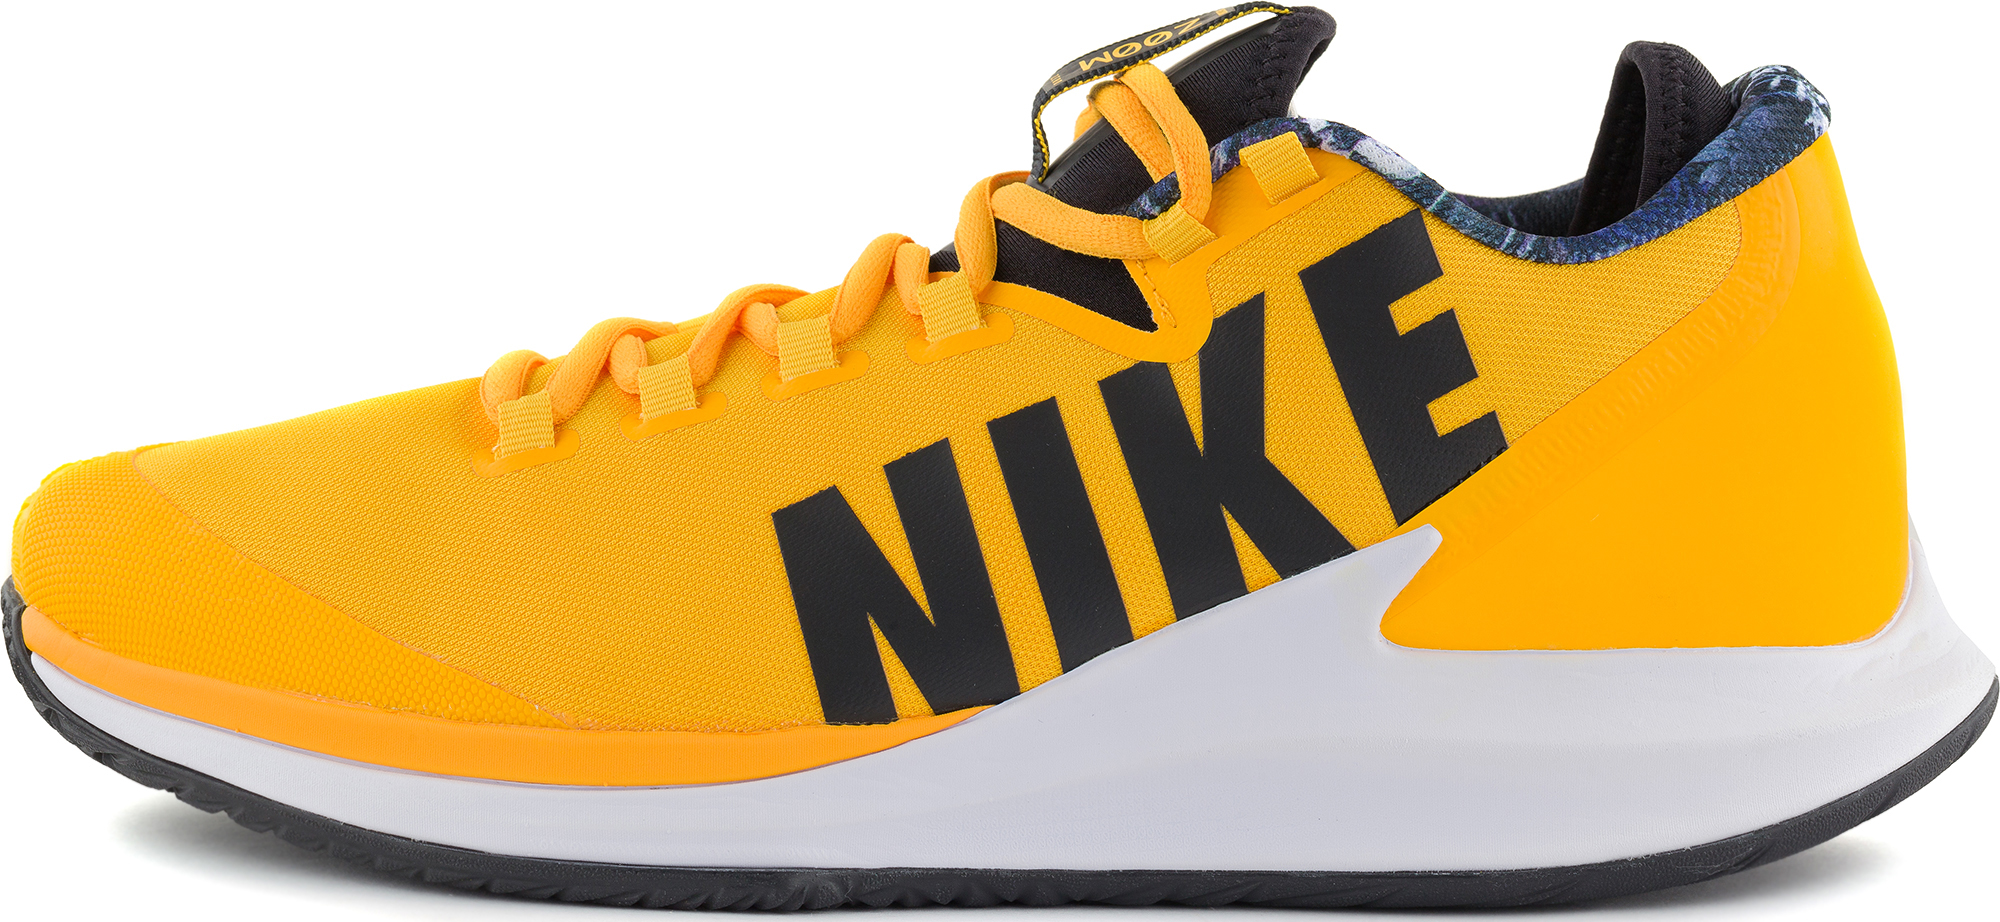 Nike Кроссовки мужские Nike Zoom Zero, размер 45 цены